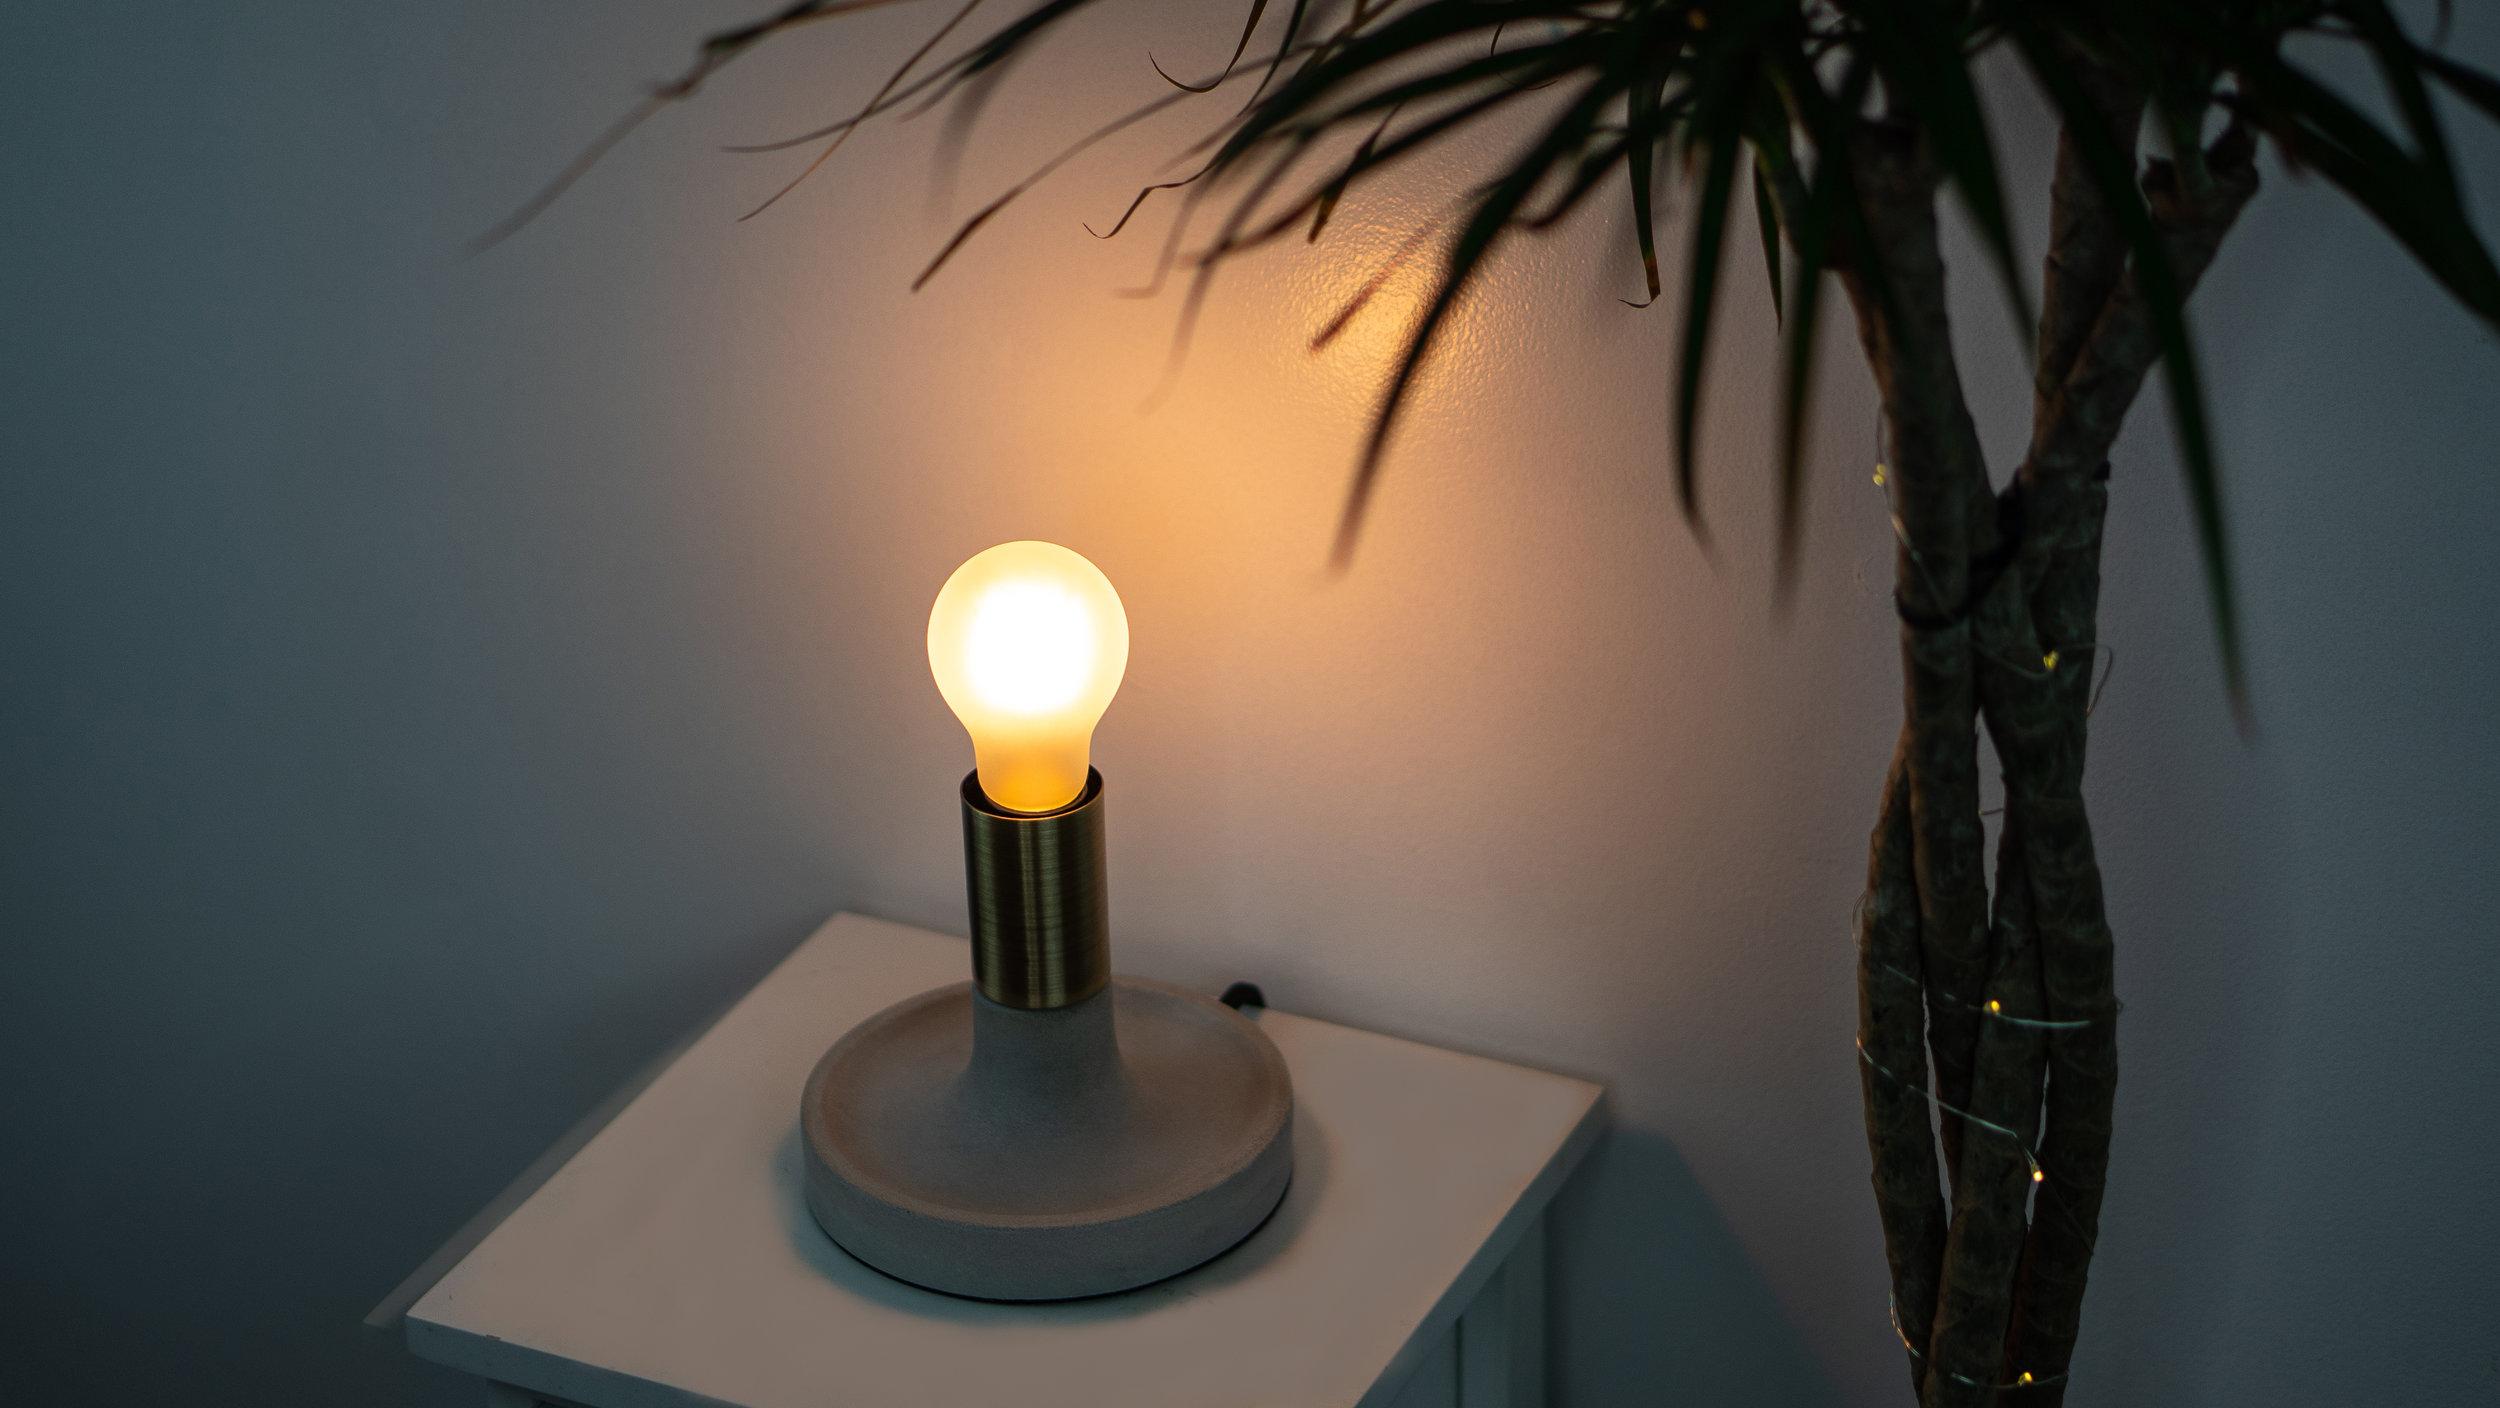 Bedtime Bulb with Tree.jpg